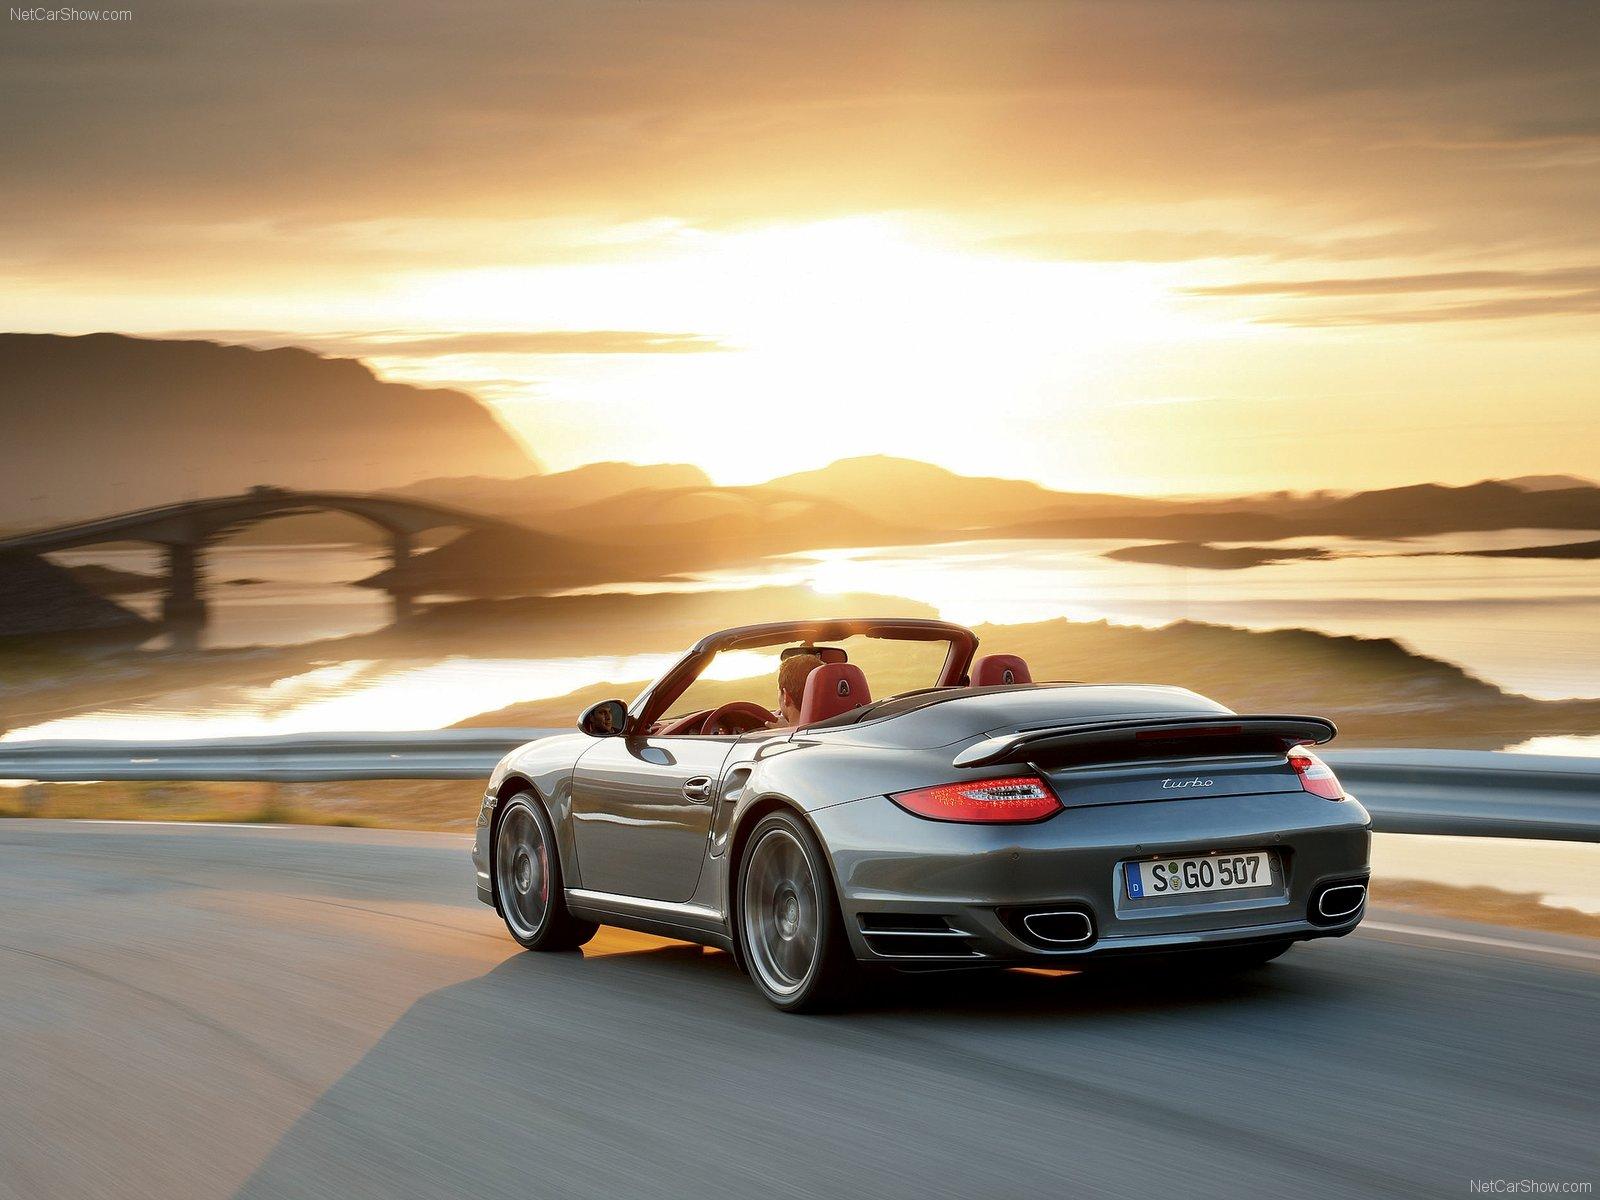 2010 Grey Porsche 911 Turbo Cabriolet wallpapers 1600x1200